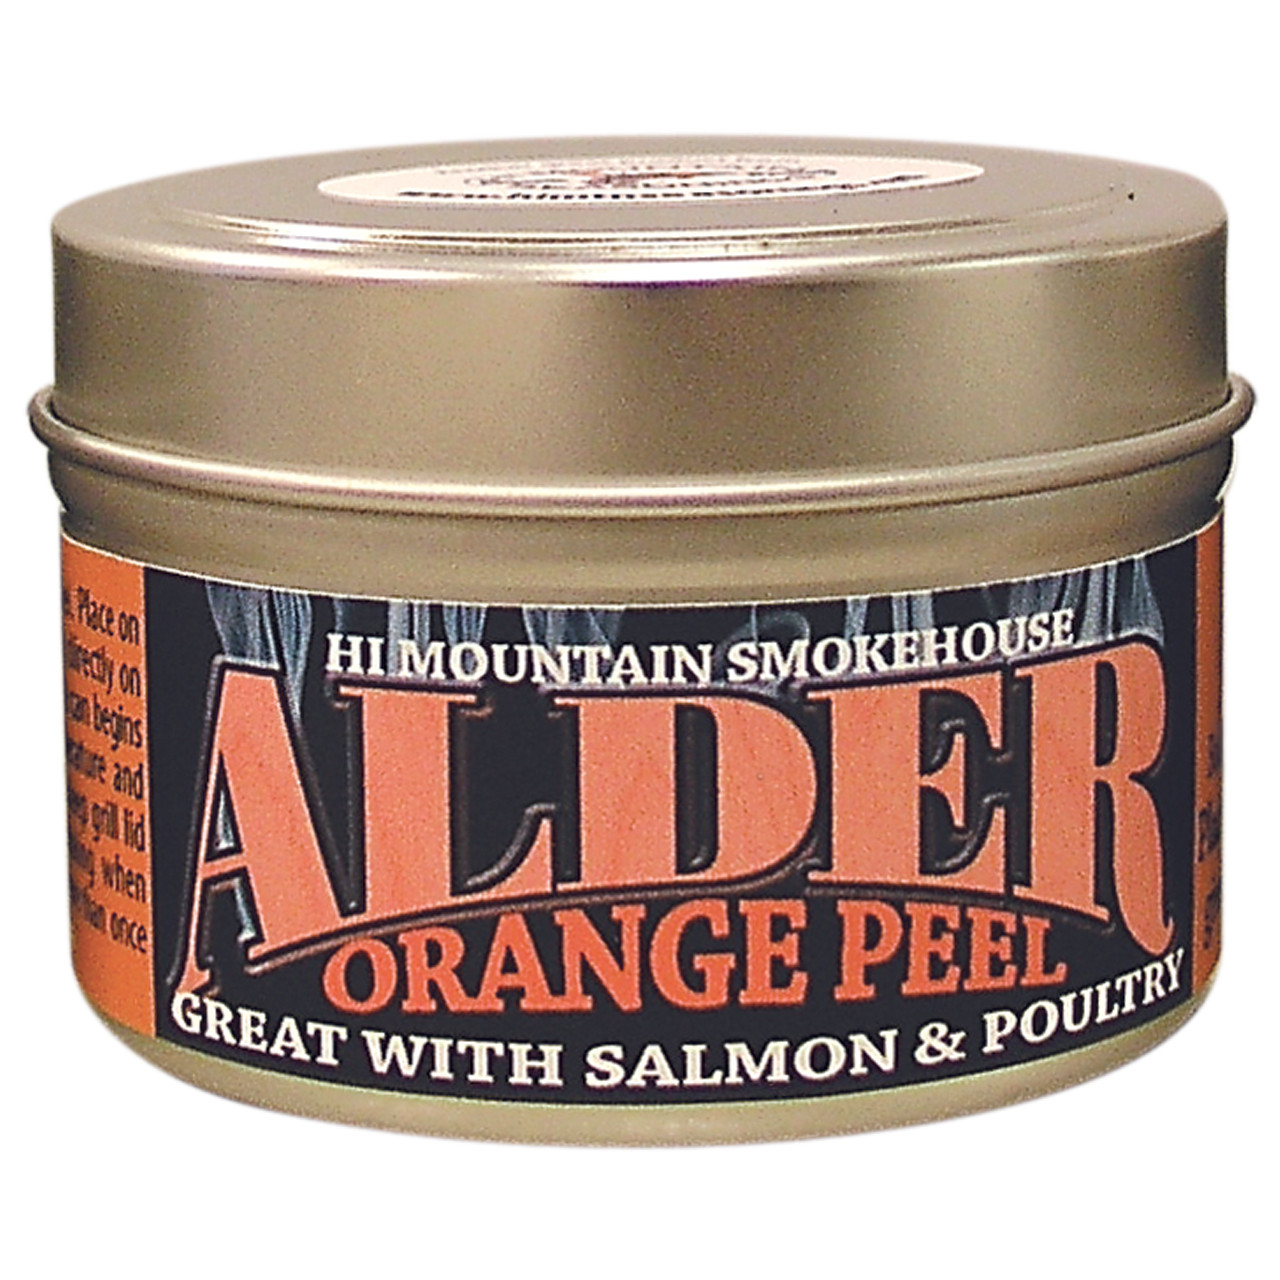 Alder Orange Peel Smokehouse Can